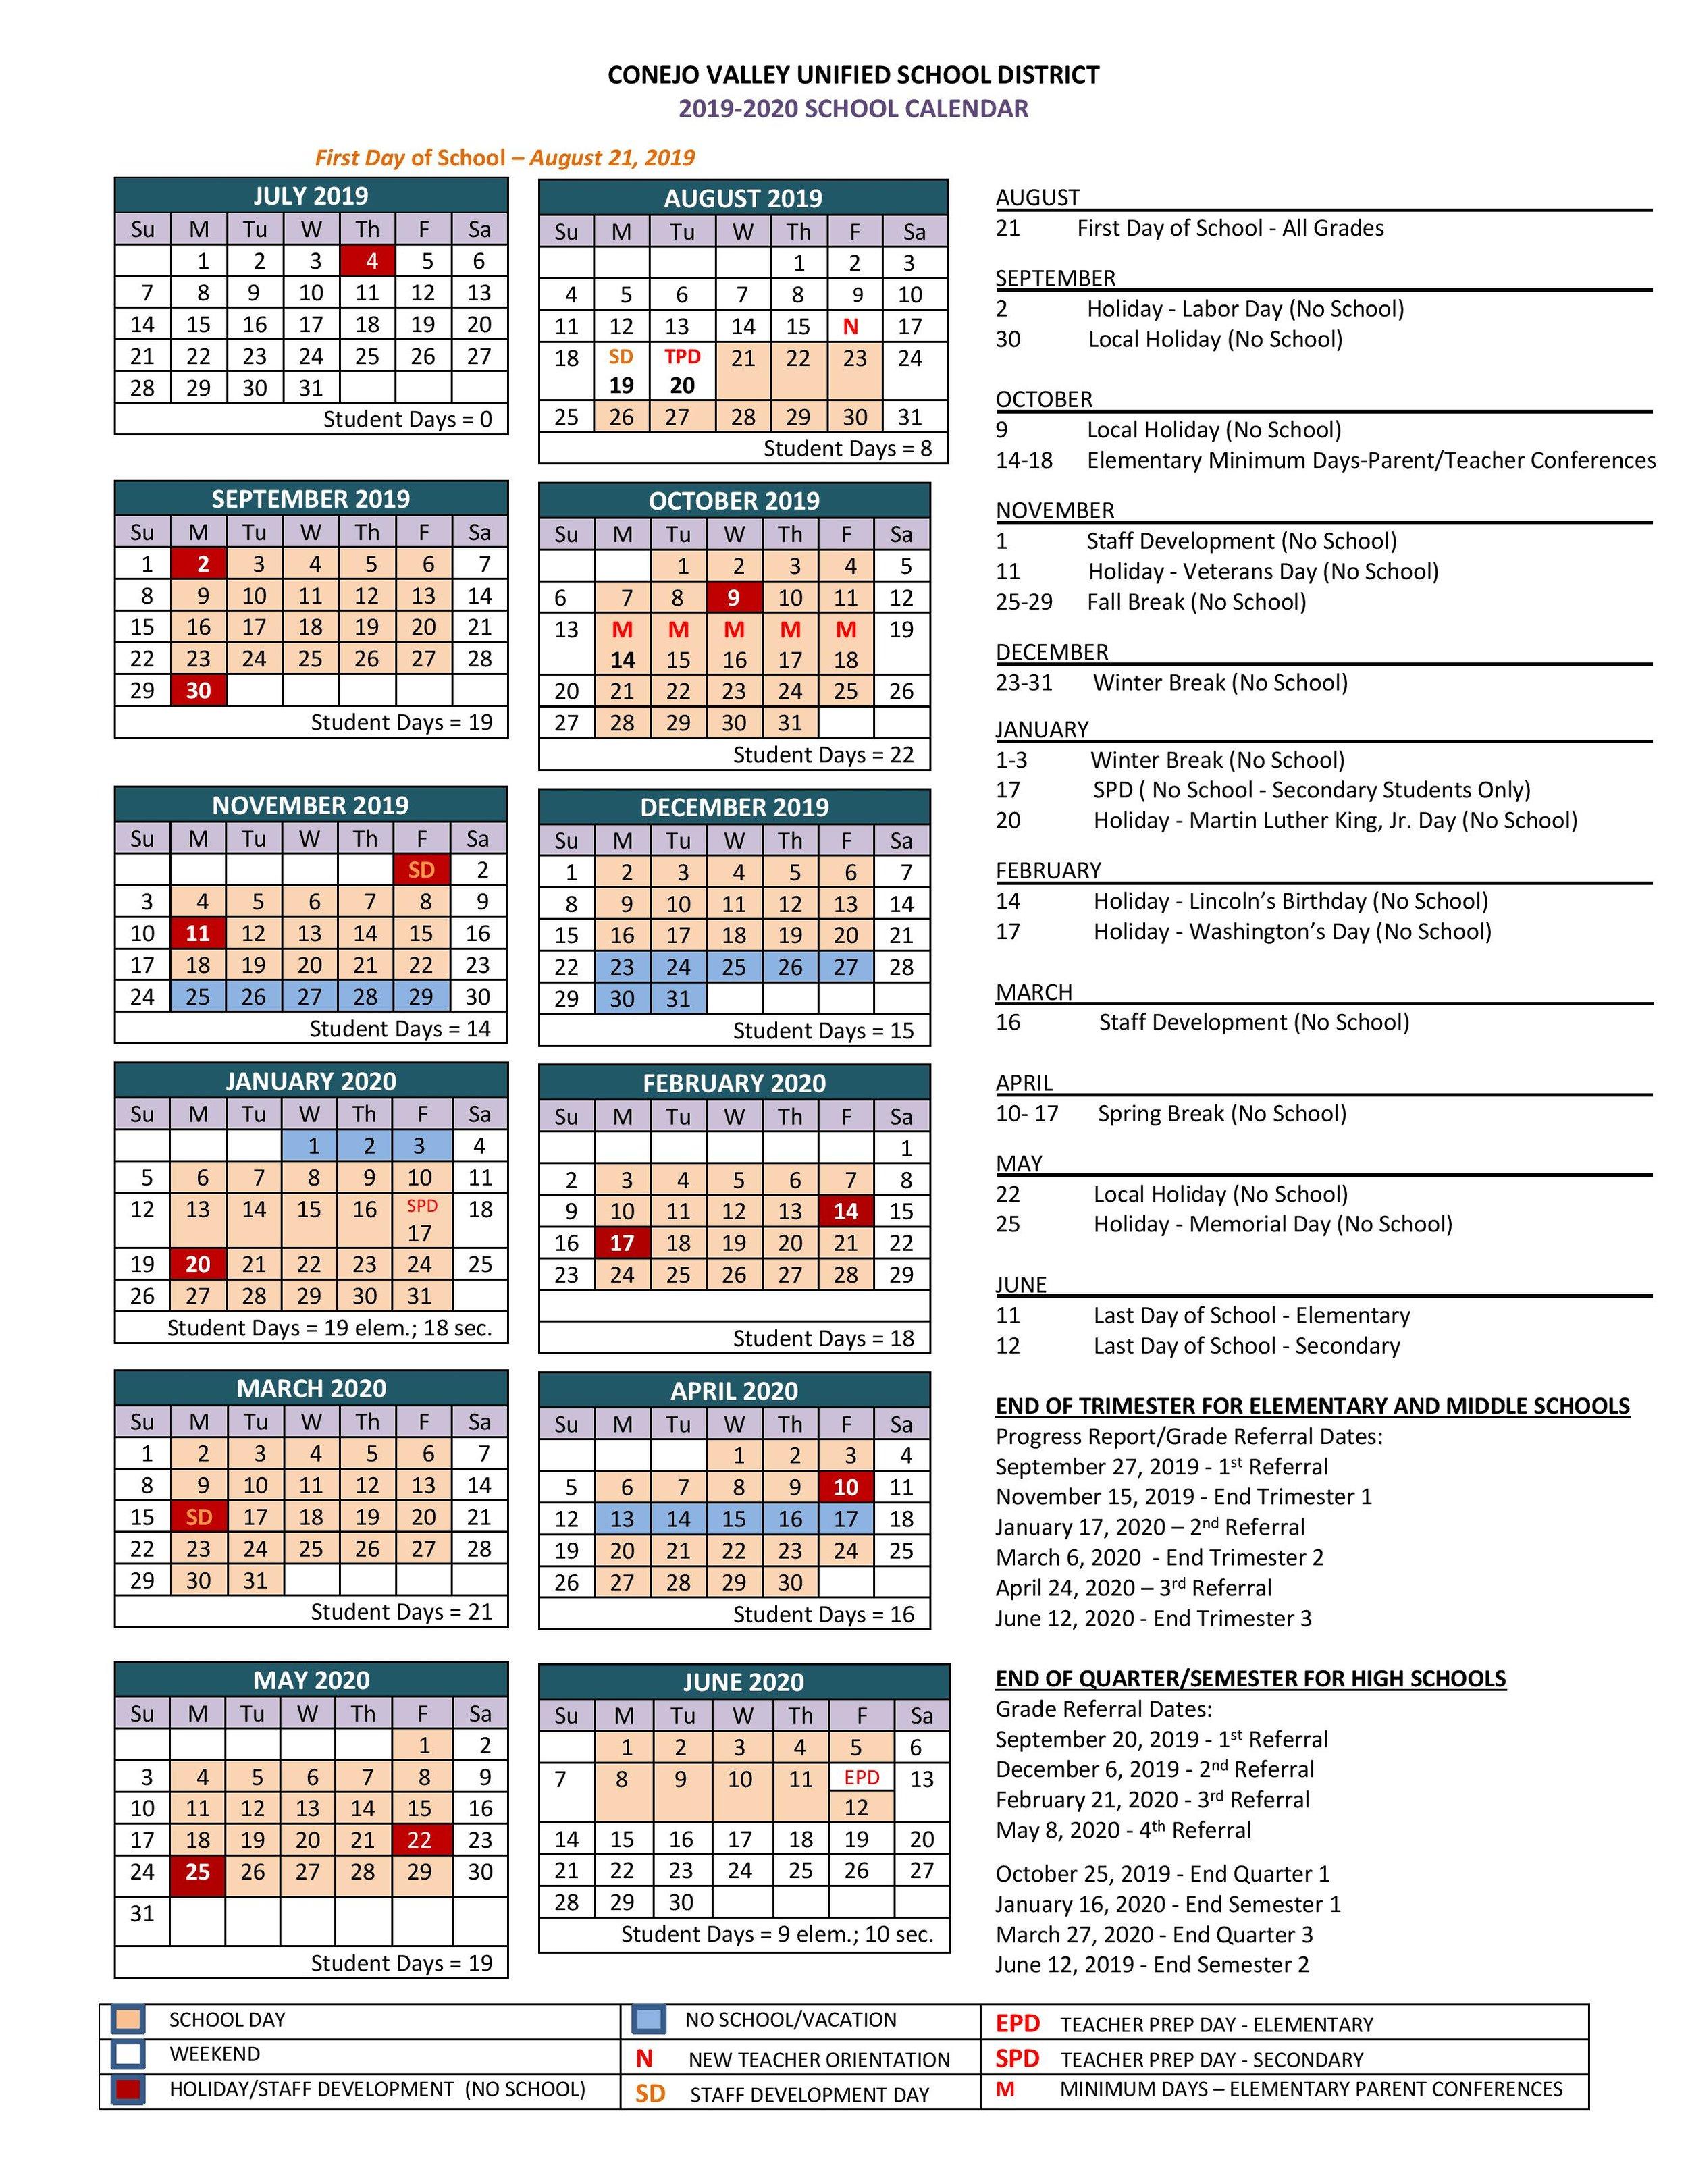 2019-2020 School Calendar - Final-page-001.jpg